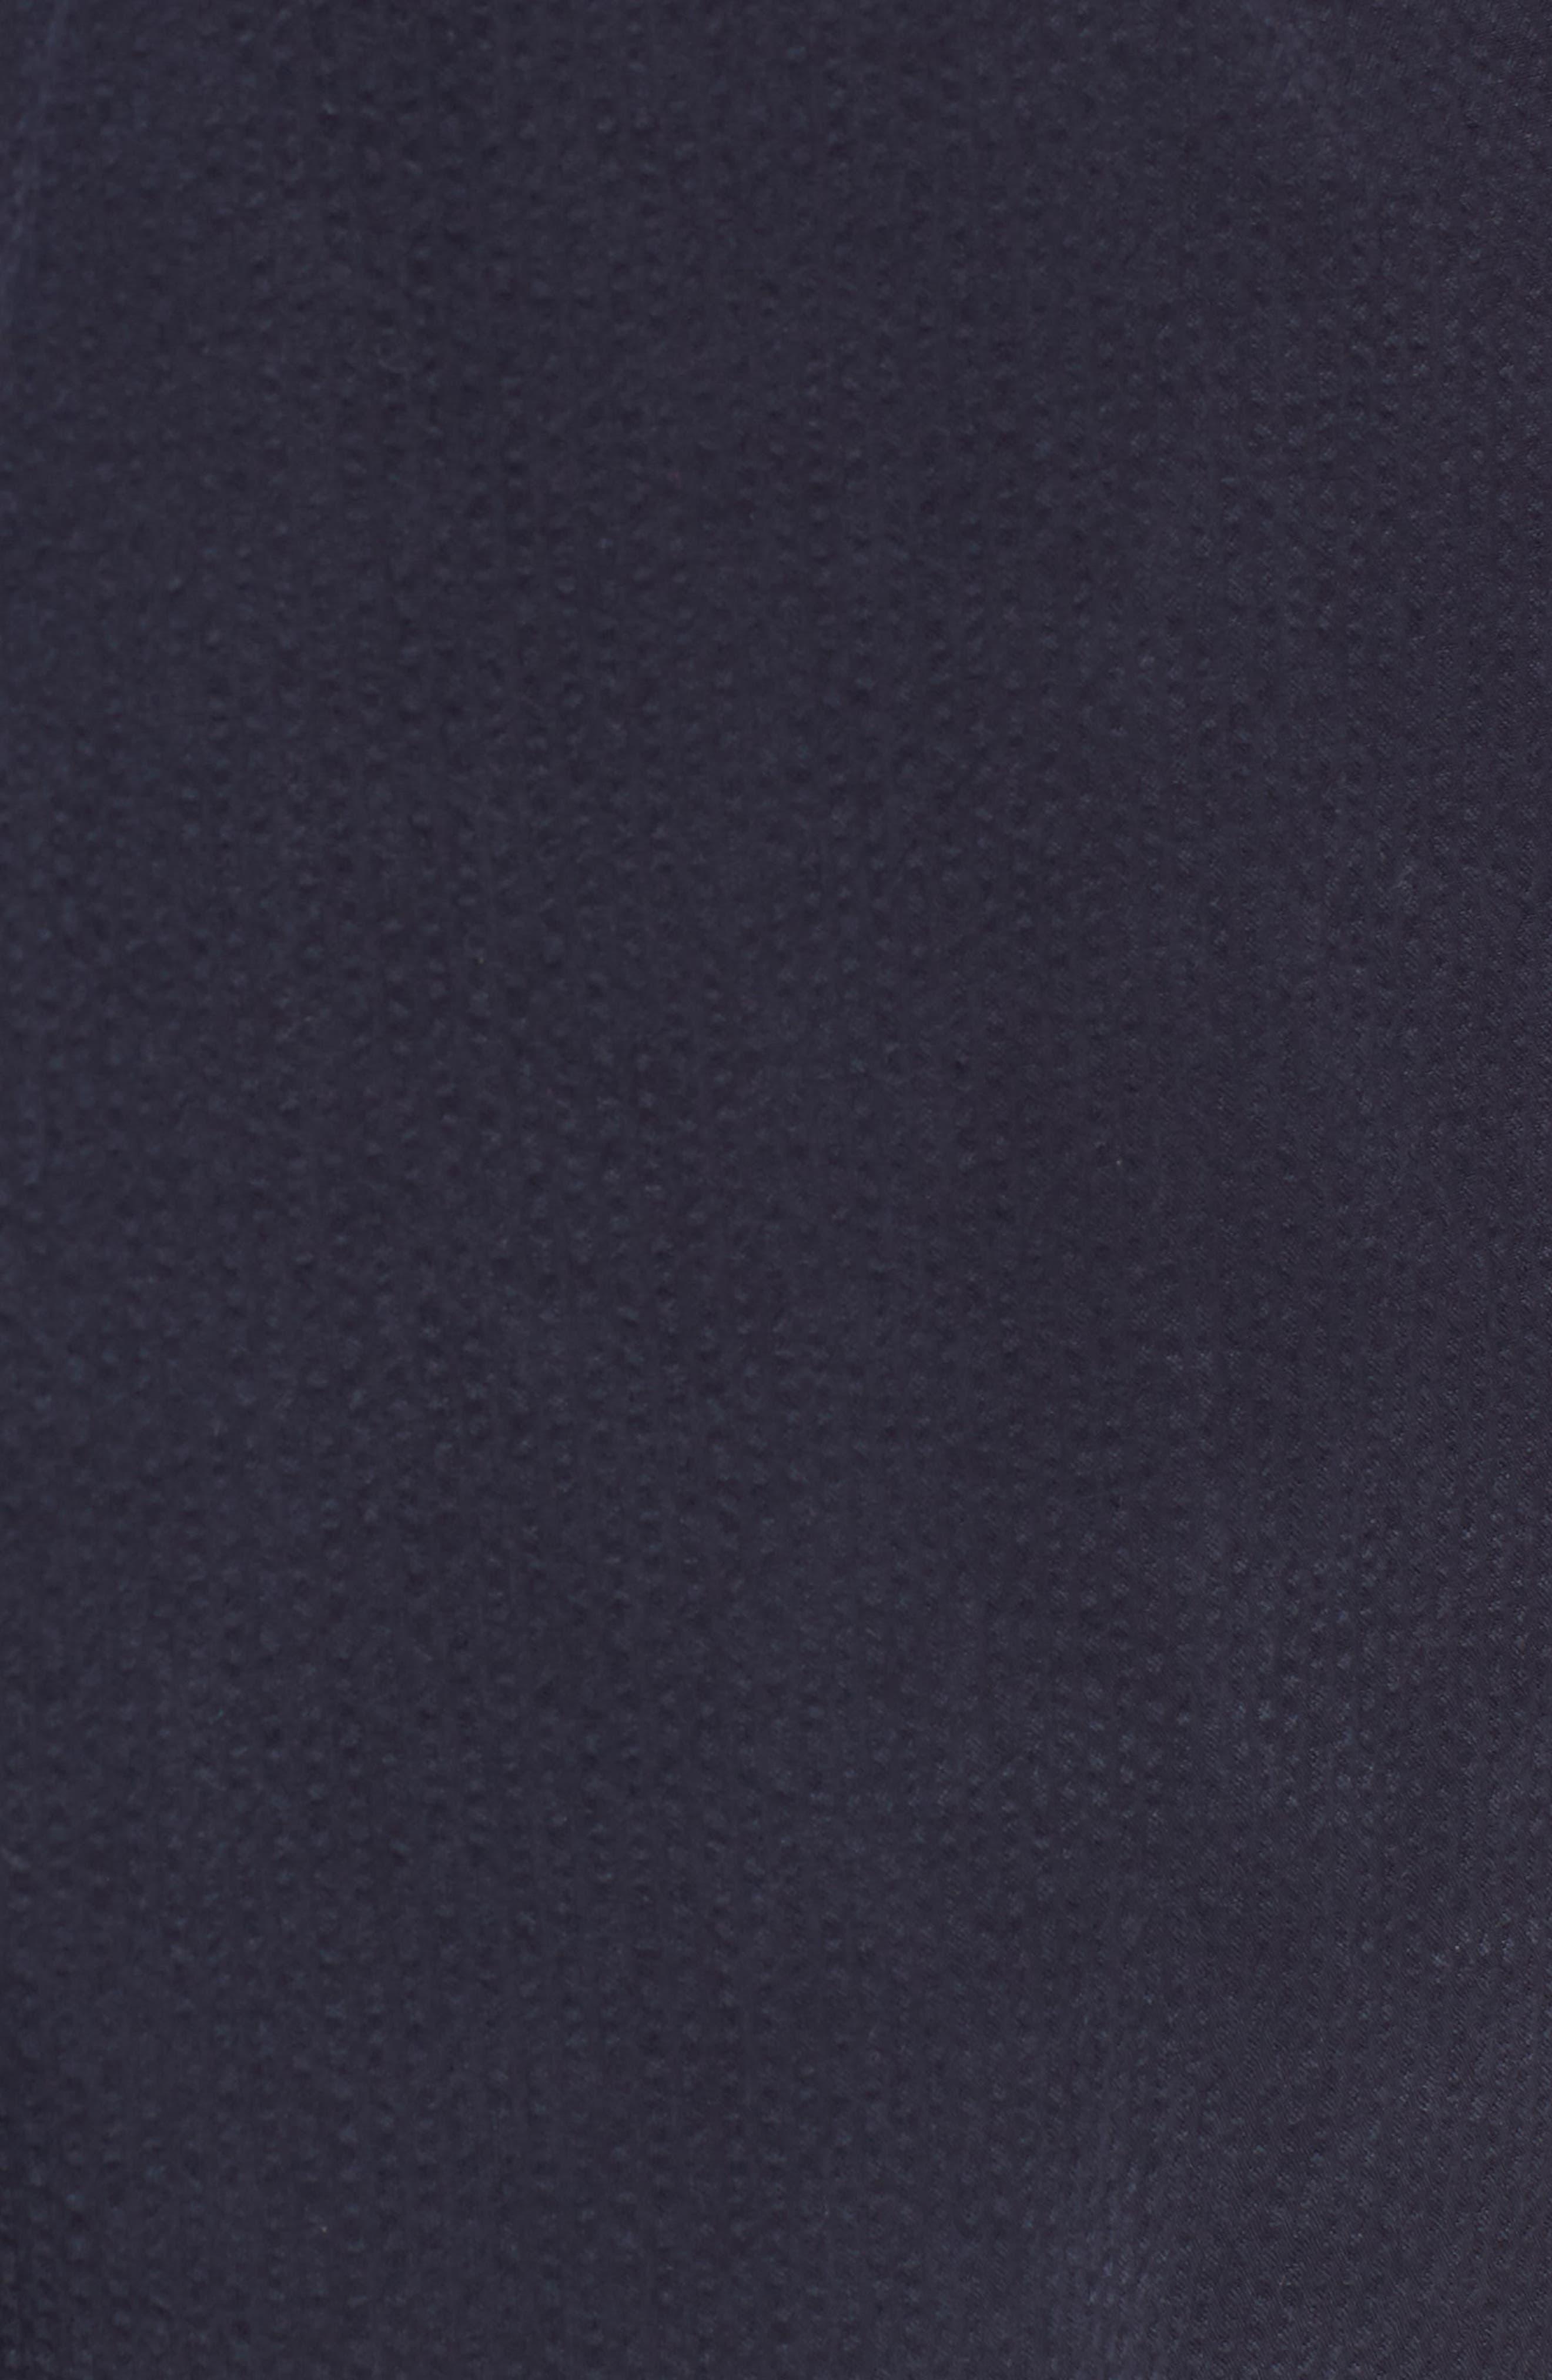 Elastic Waist Seersucker Shorts,                             Alternate thumbnail 5, color,                             Navy Night Seersucker